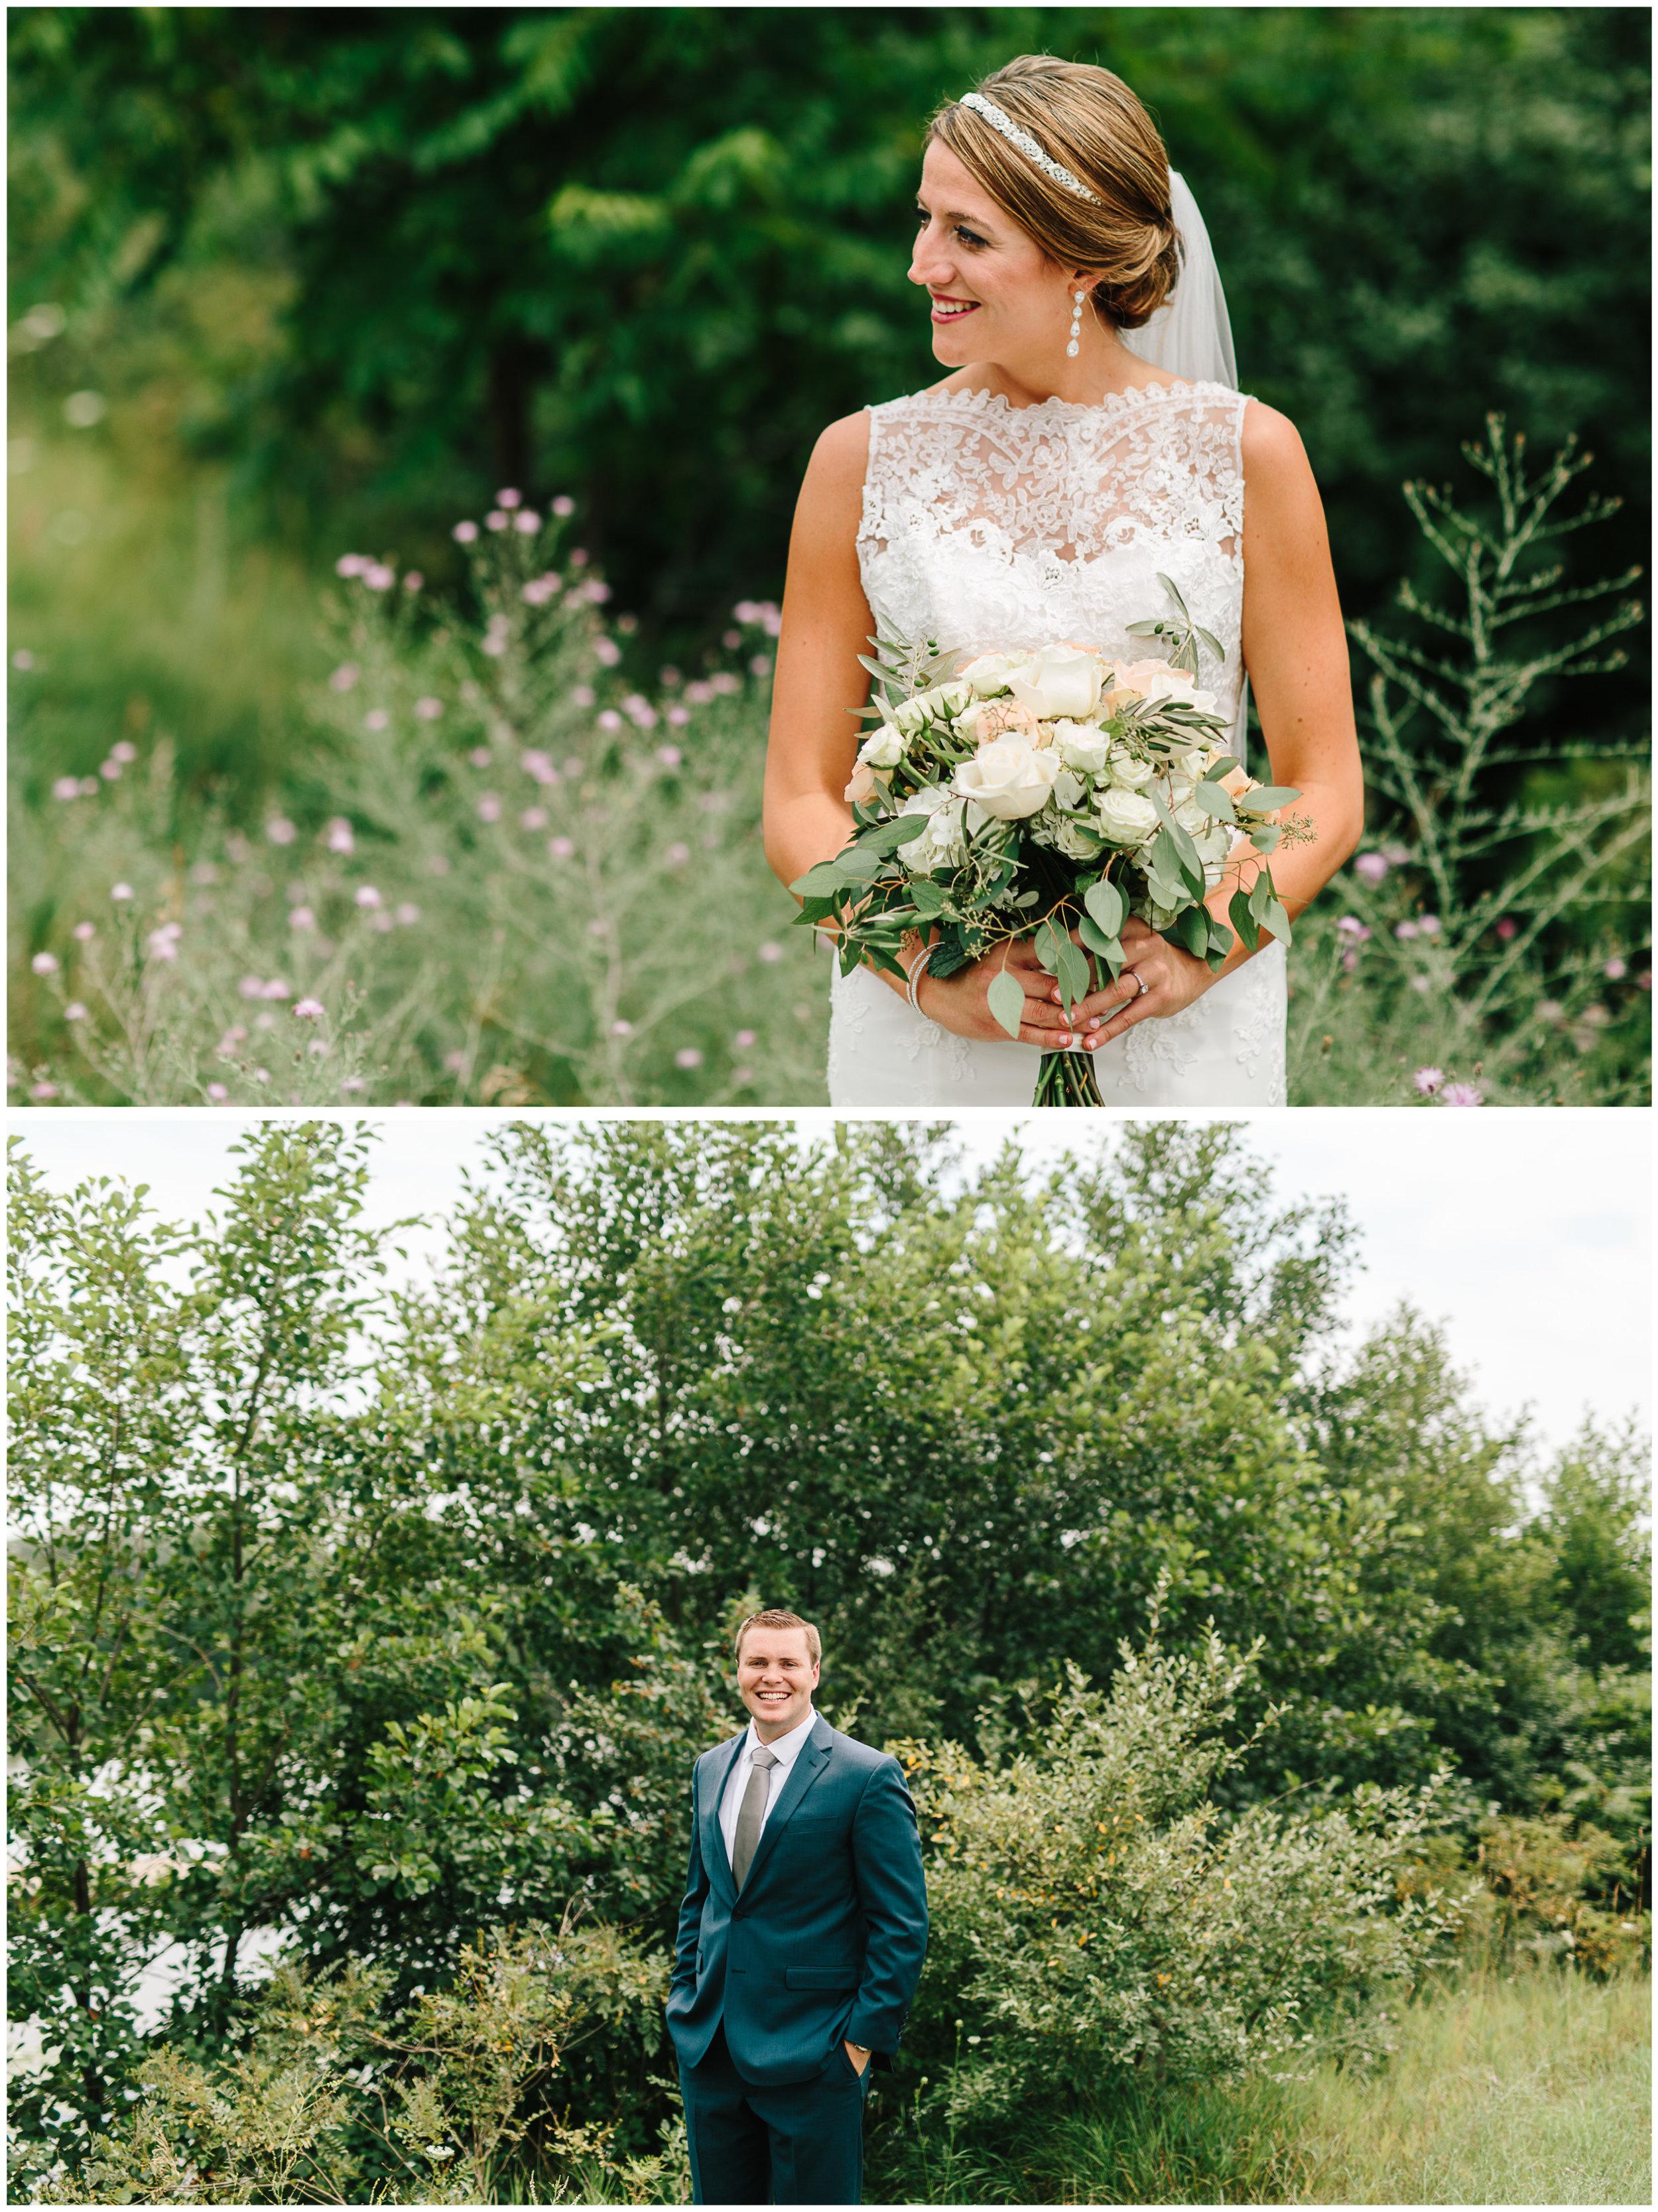 ann_arbor_michigan_wedding_42.jpg